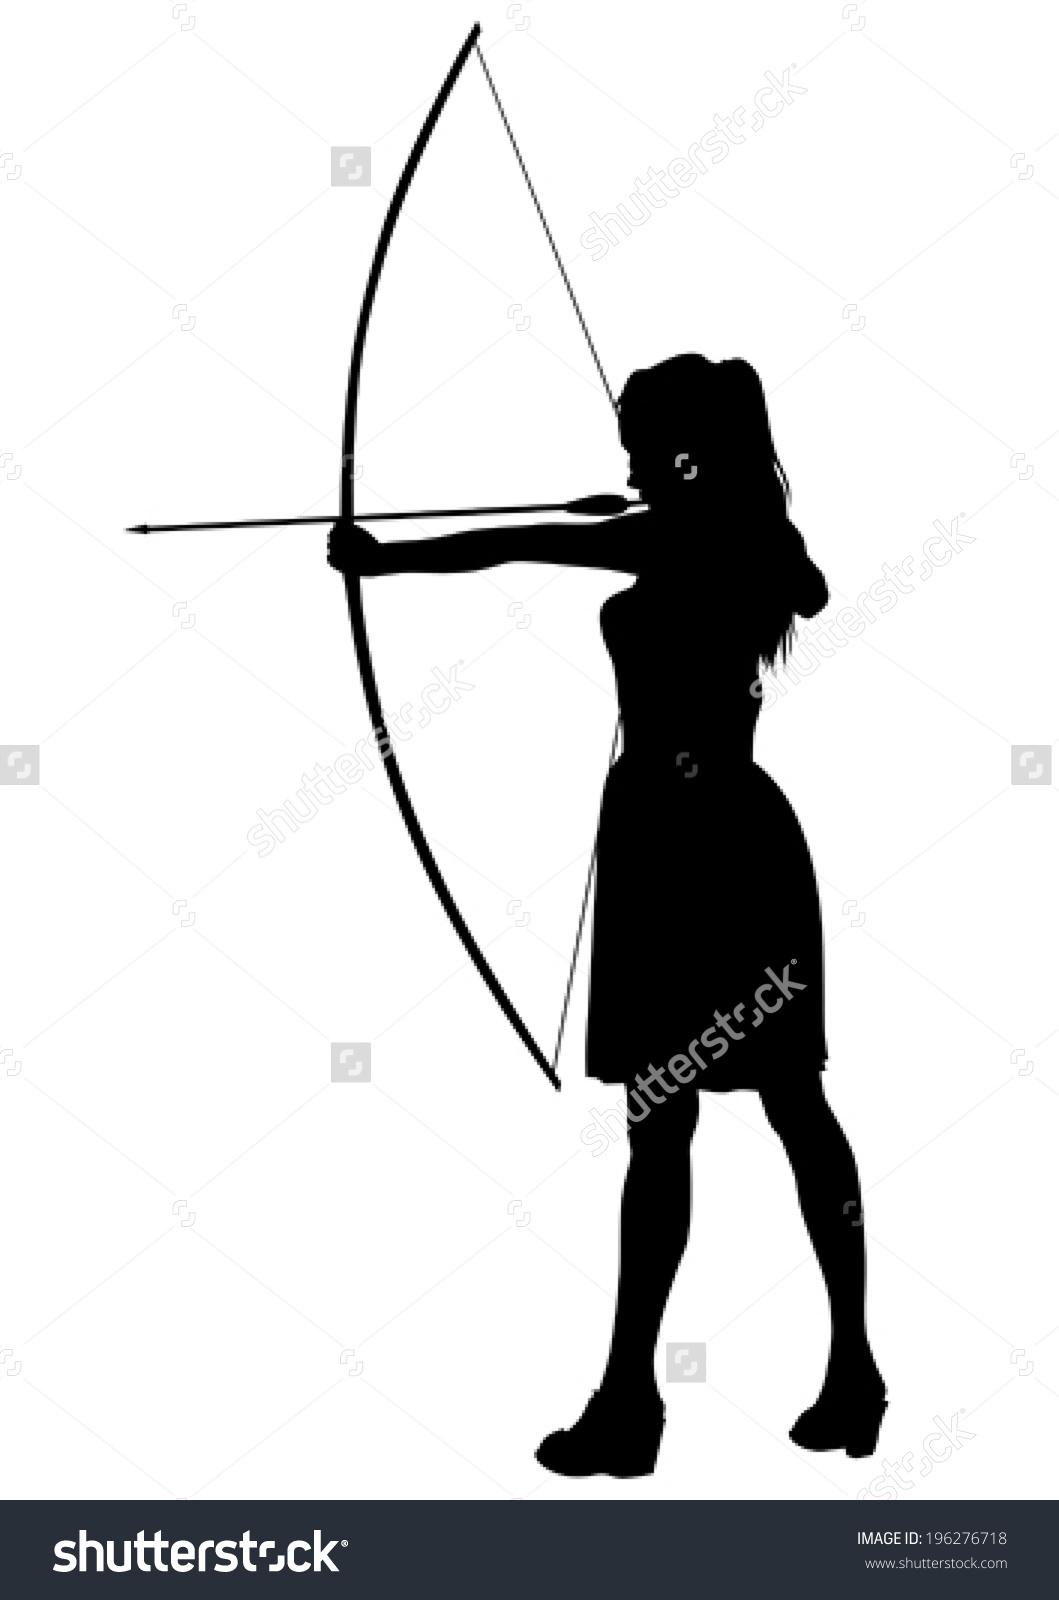 1059x1600 Archery Couple Silhouette Clipart